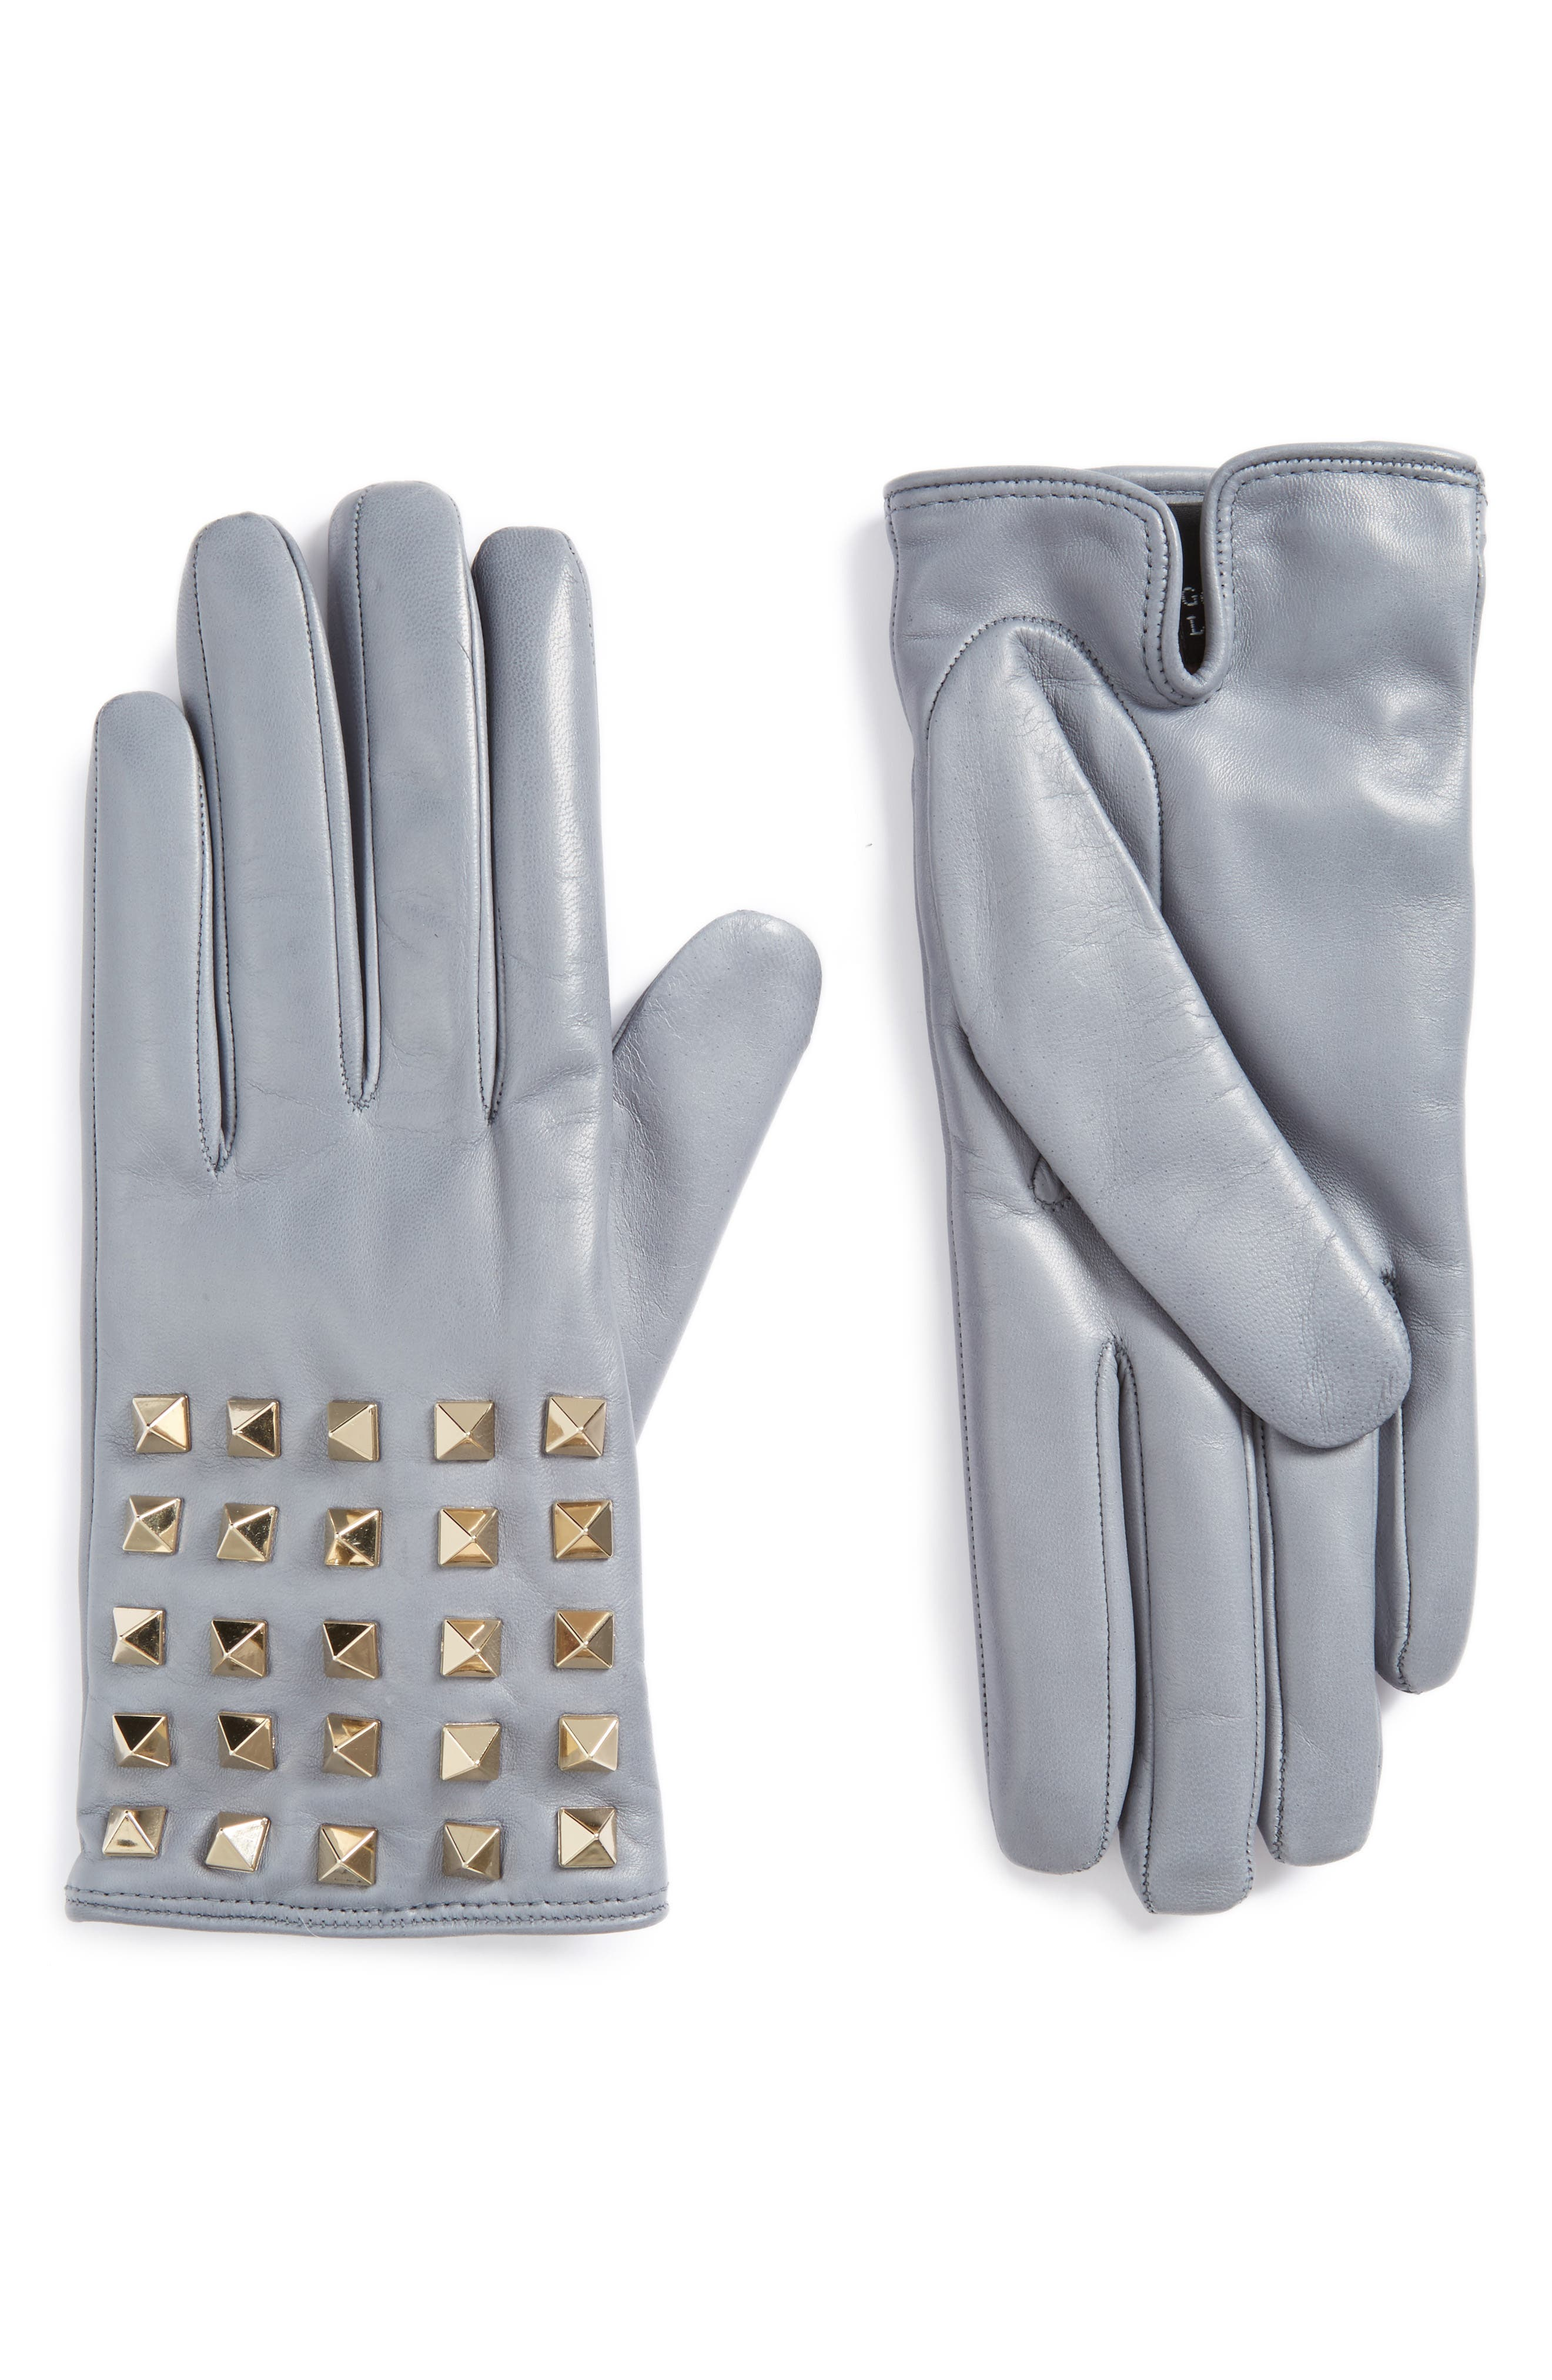 VALENTINO, GARAVANI Rockstud Leather Gloves, Main thumbnail 1, color, POWDER